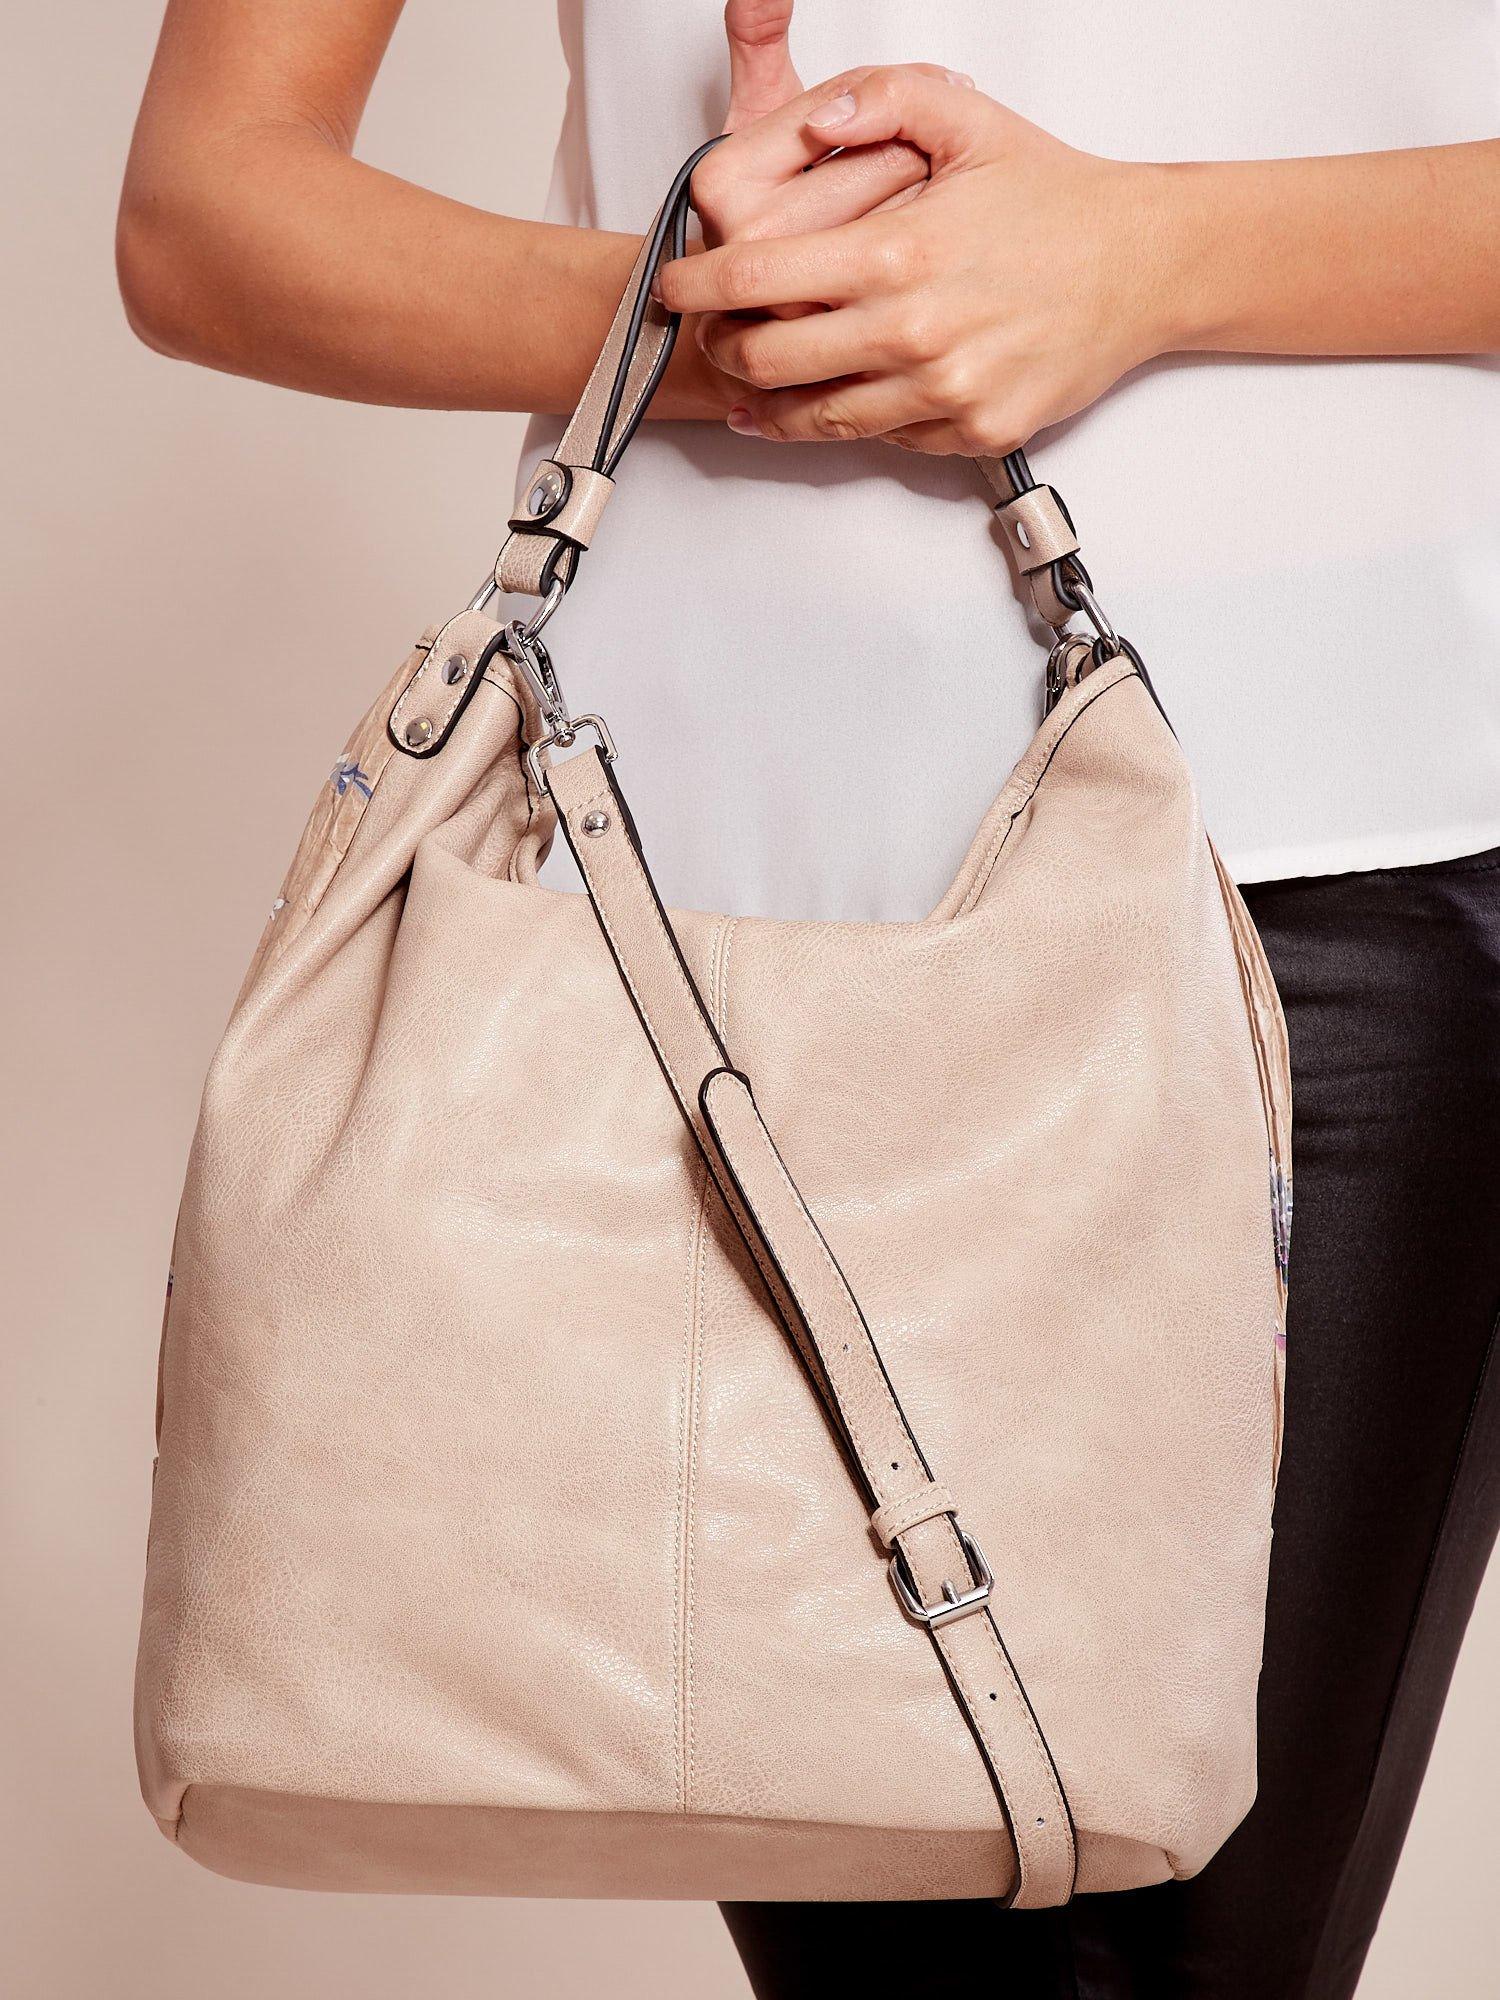 Orientálna béžová kabelka na rameno - UNI